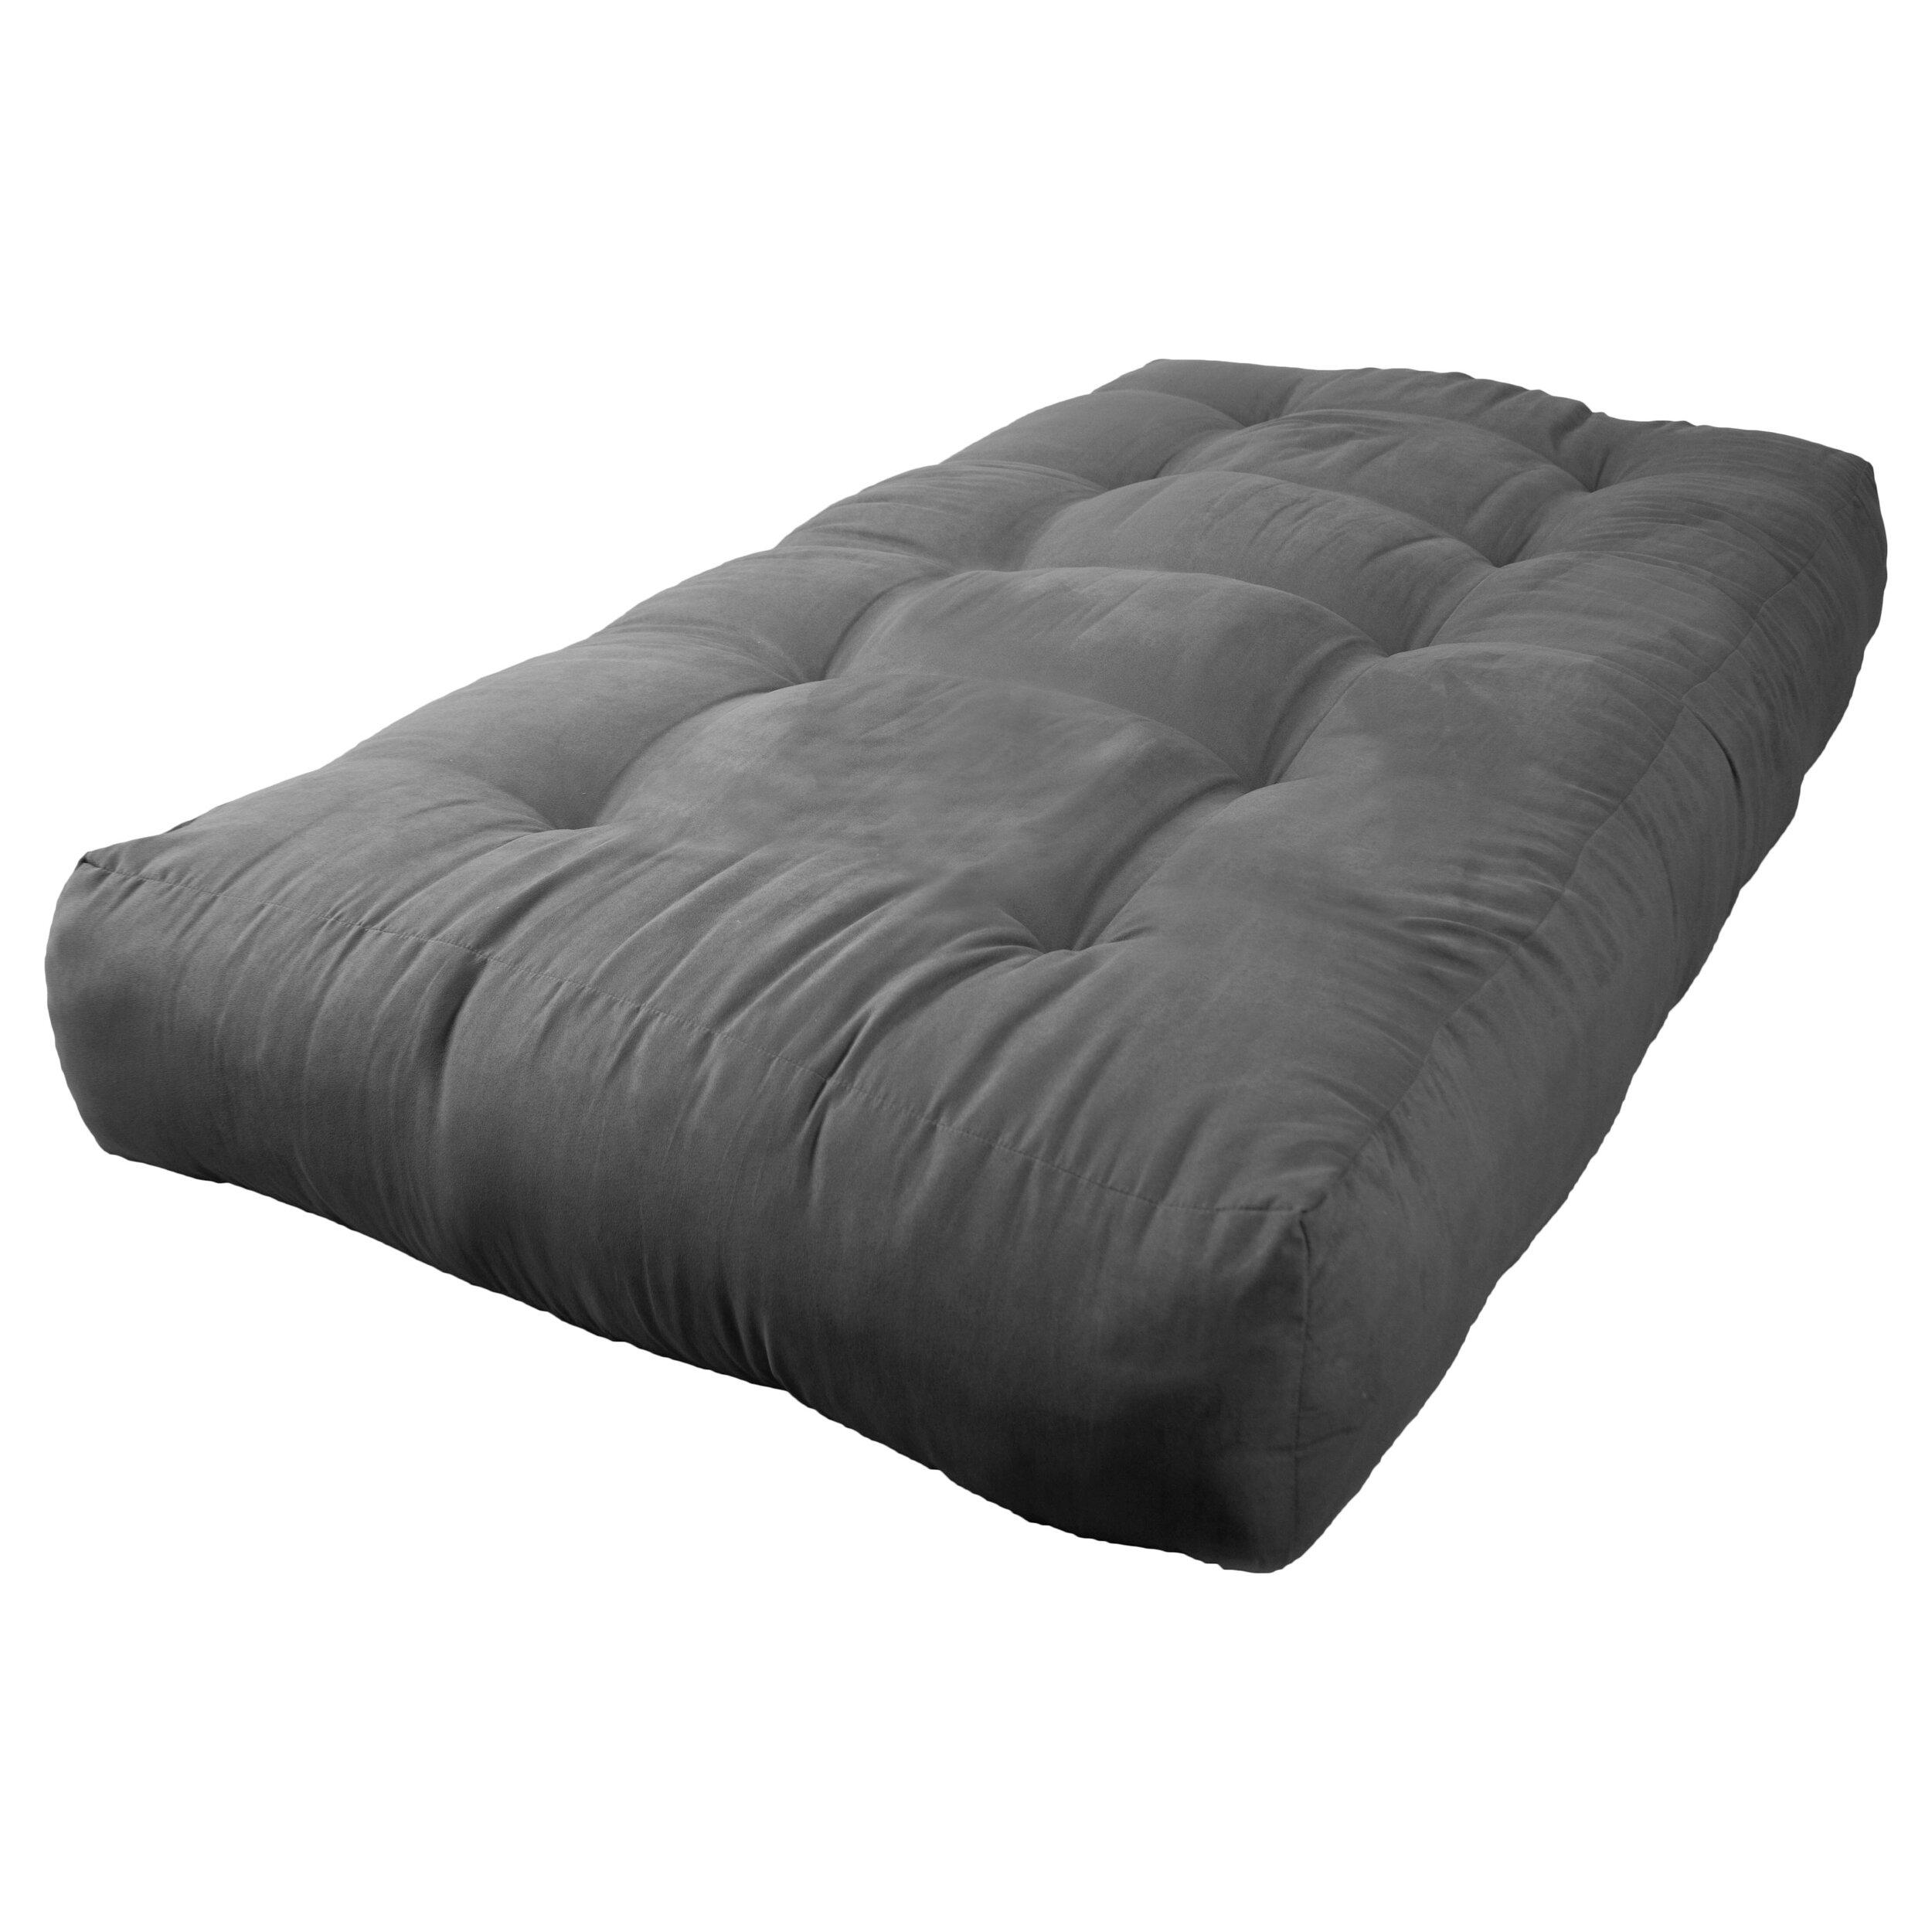 blazing needles vitality 10   cotton foam futon mattress  u0026 reviews   wayfair blazing needles vitality 10   cotton foam futon mattress  u0026 reviews      rh   wayfair